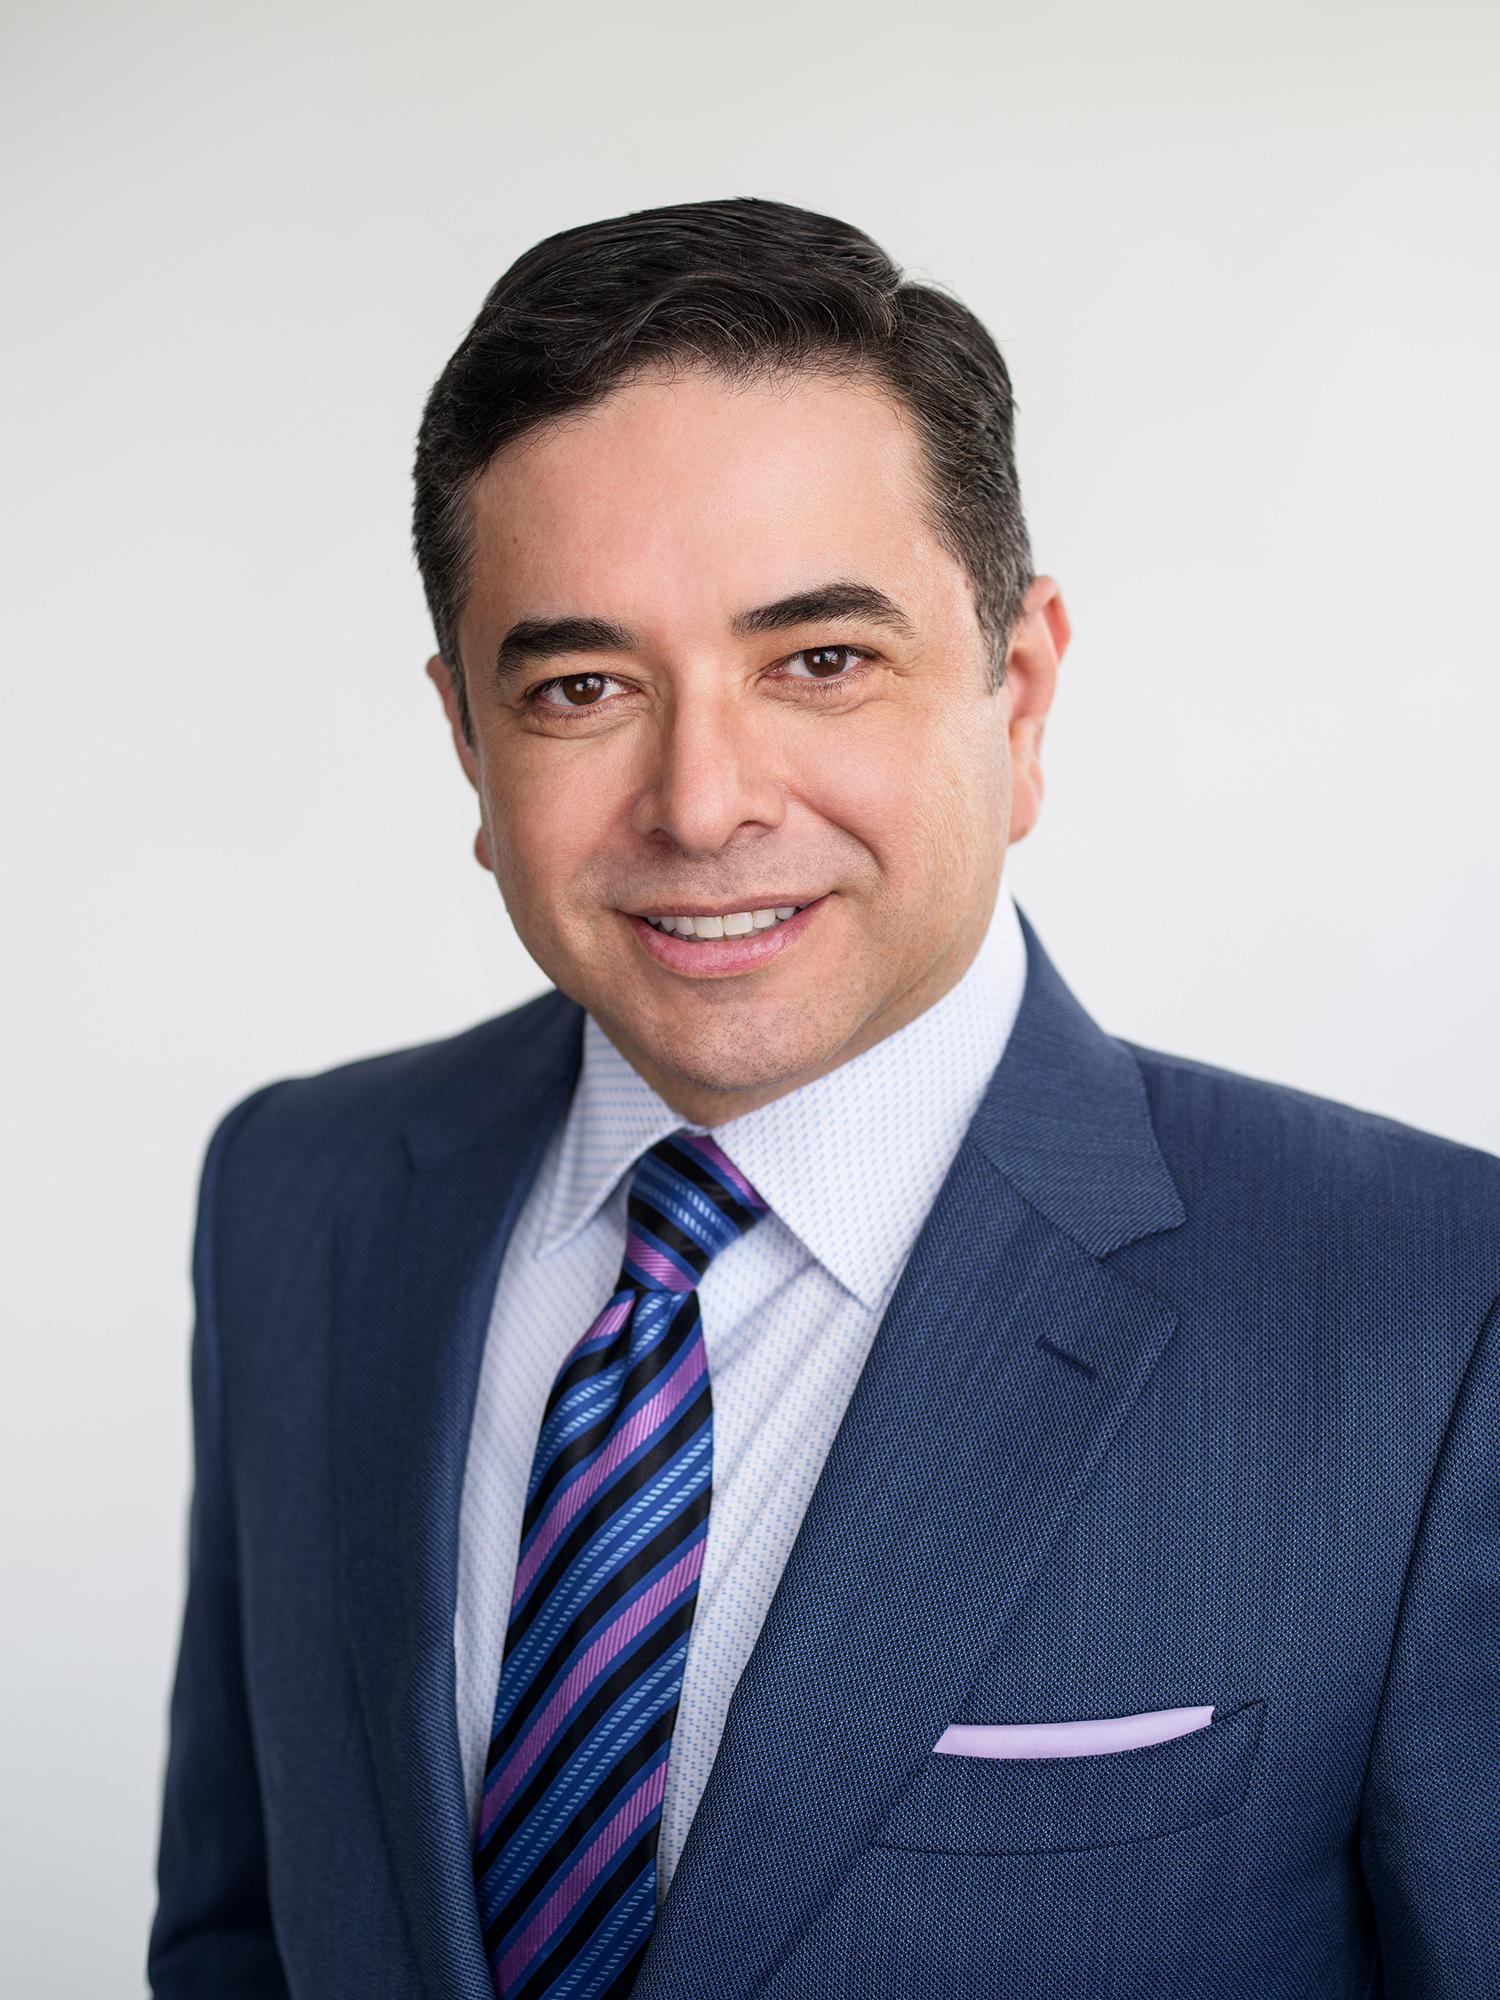 Dr. Esteban López